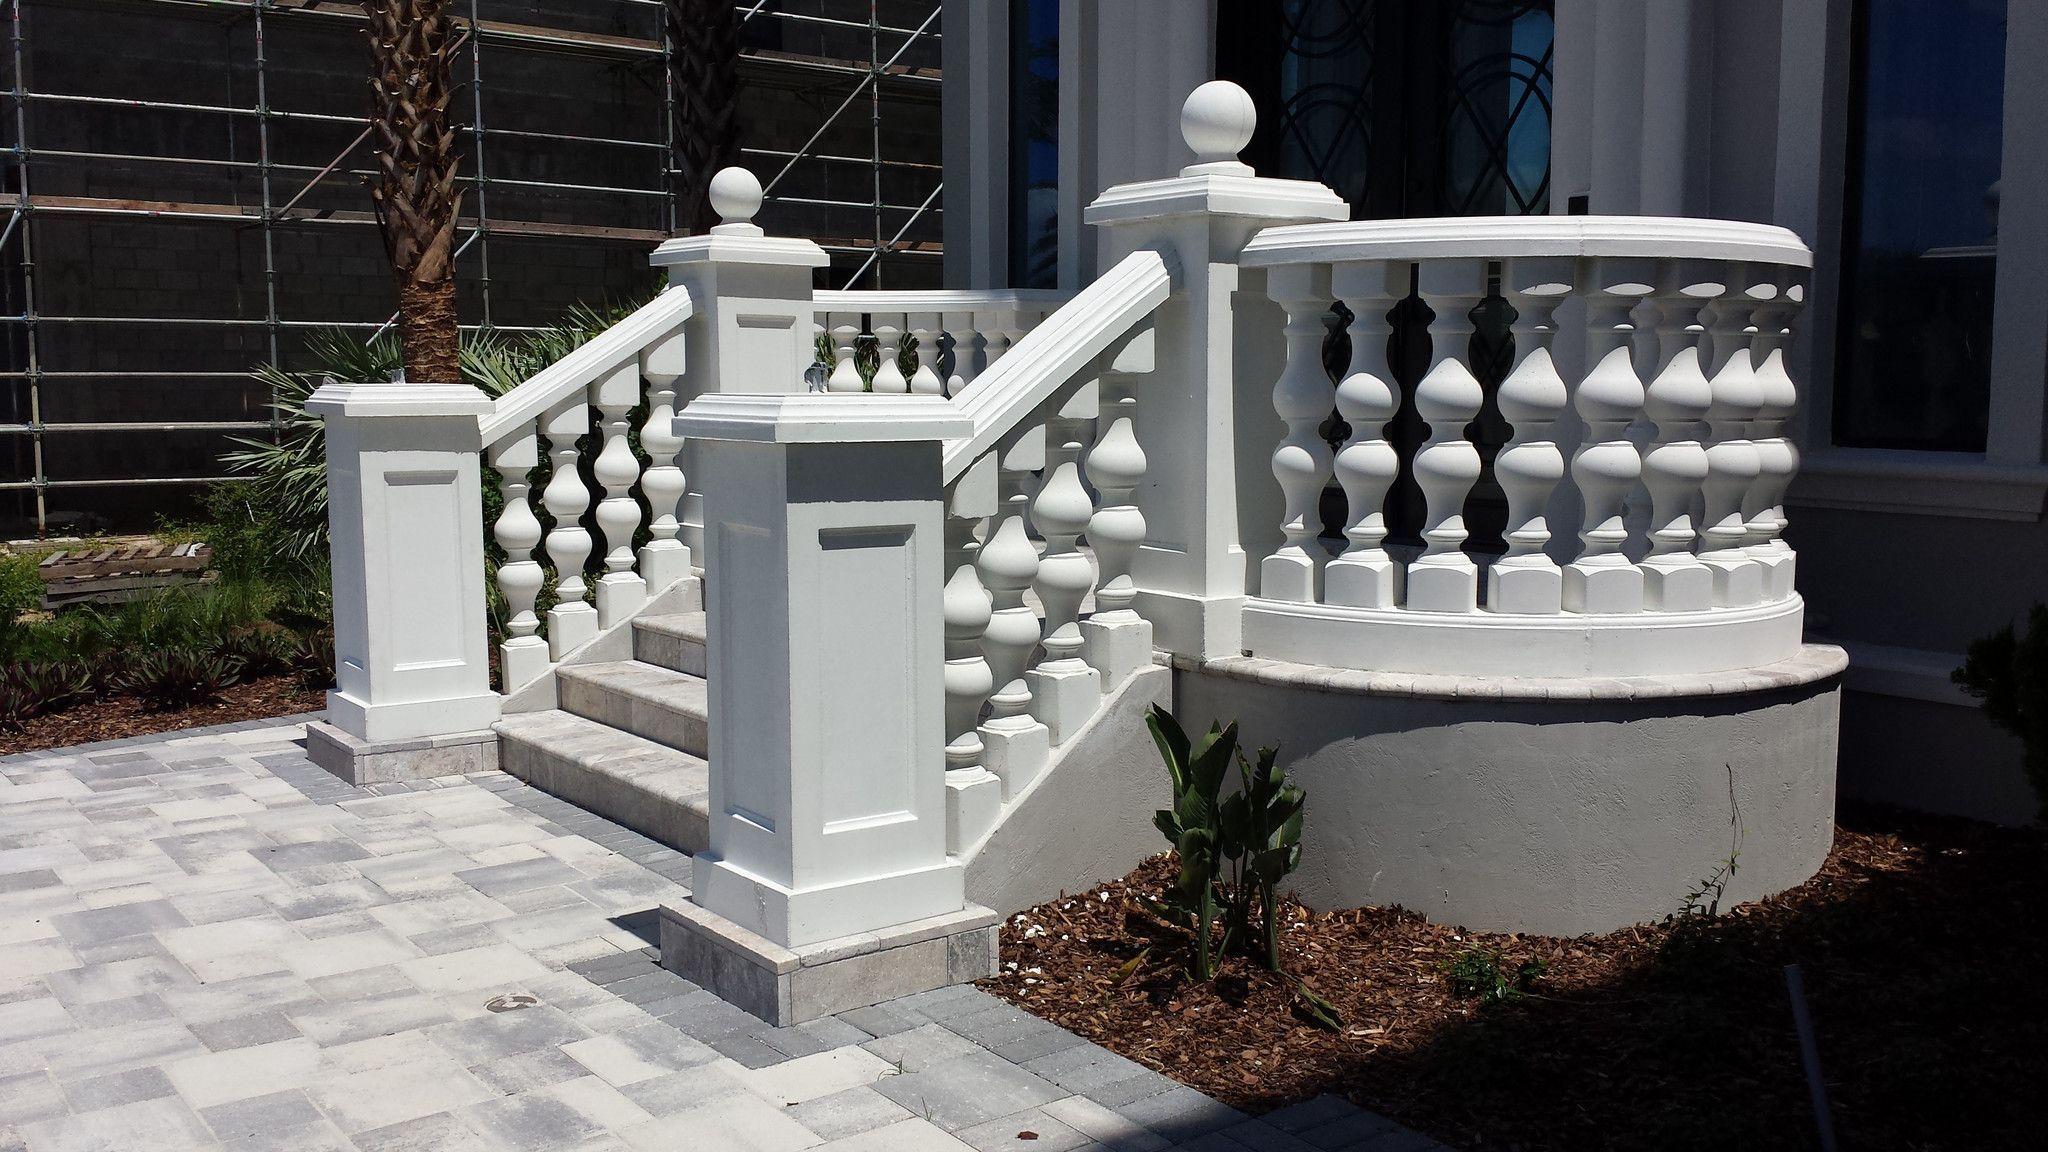 The Venetian Baluster Mold Designed For Commercial Height